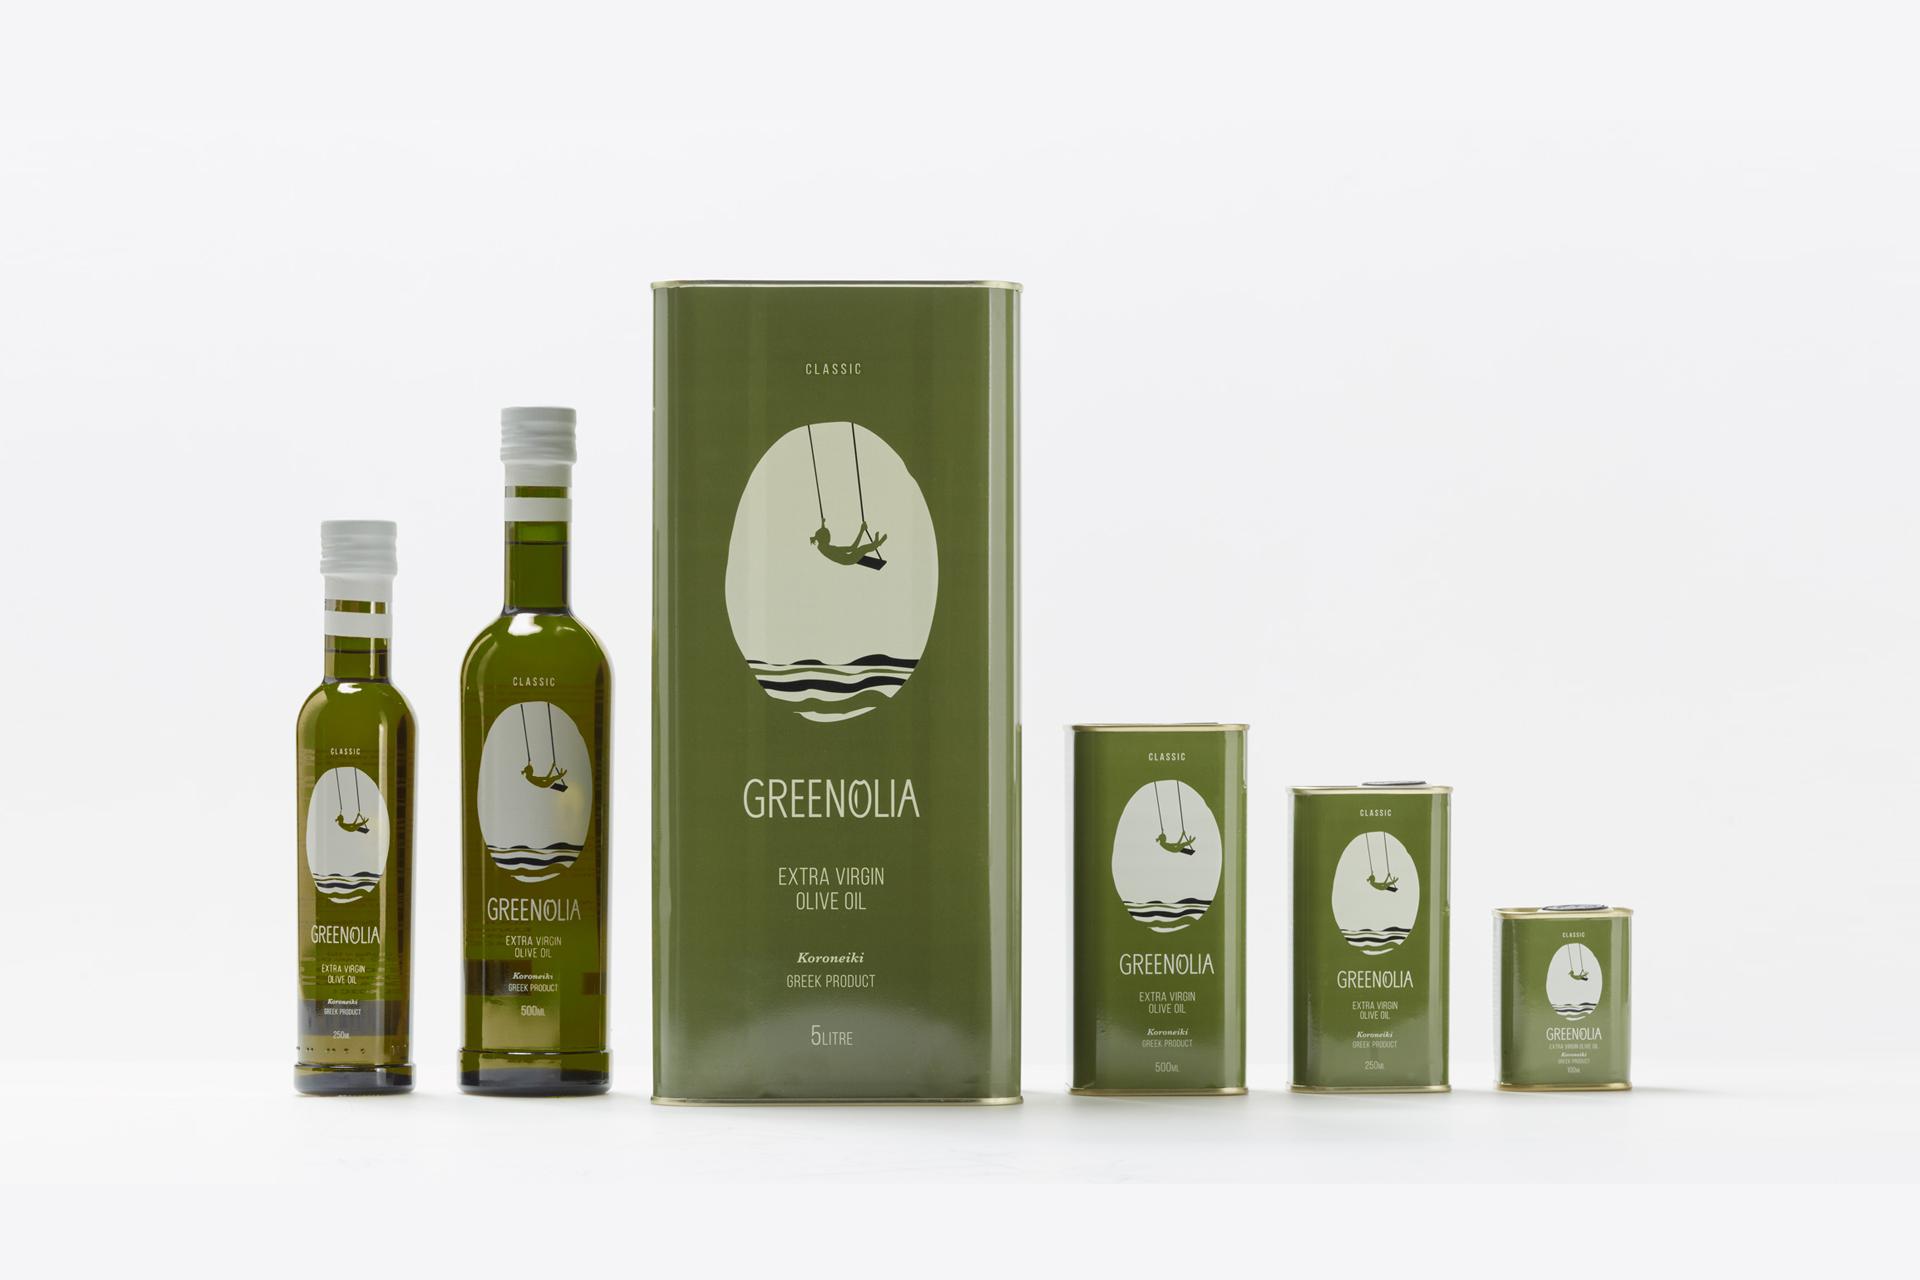 Classic αγνό Ελαιόλαδο Greenolia - ολα